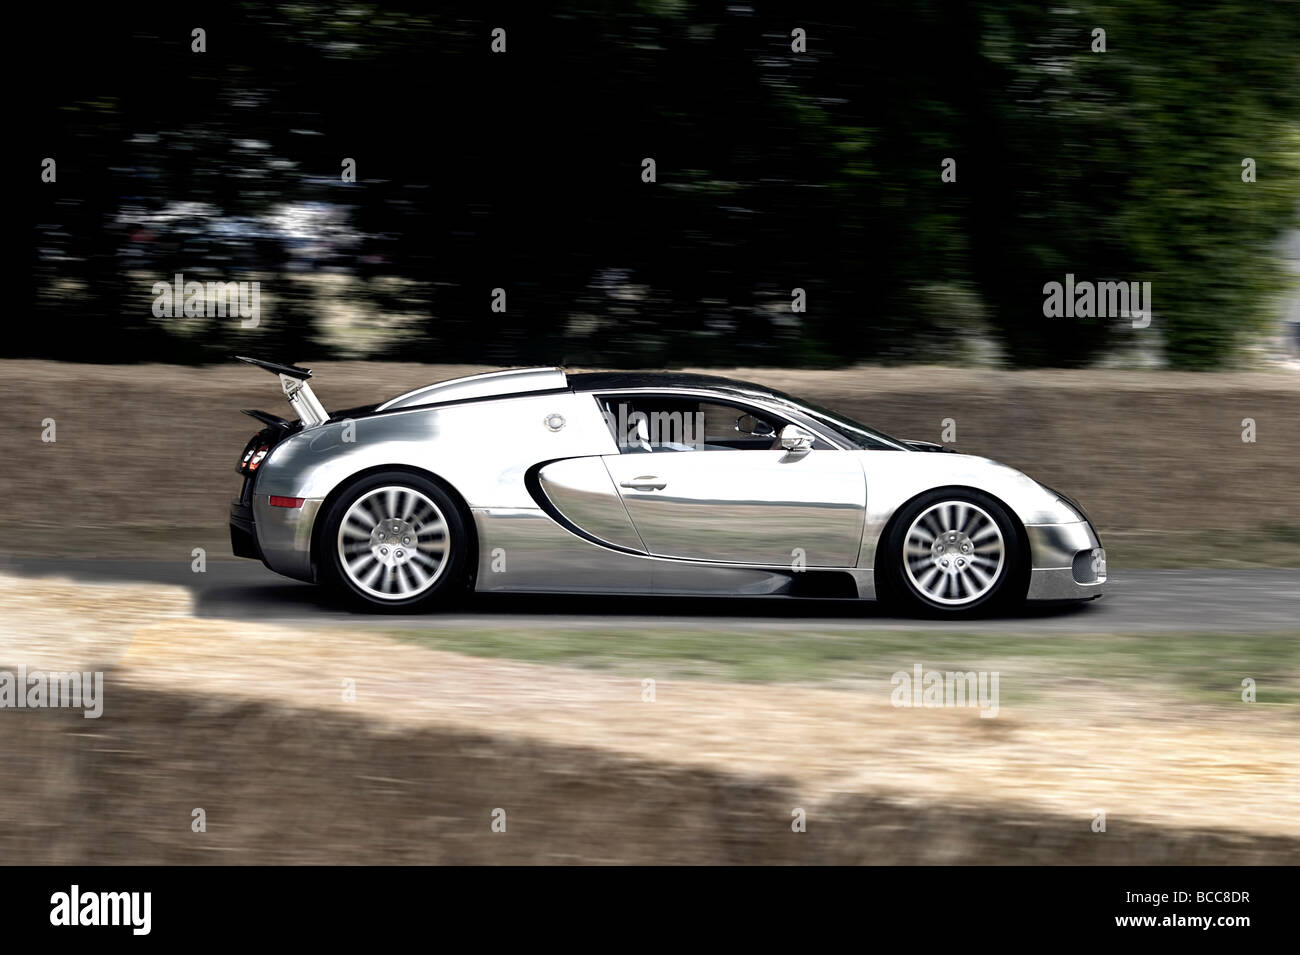 Bugatti Veyron Super Sport Stock Photos Bugatti Veyron Super Sport